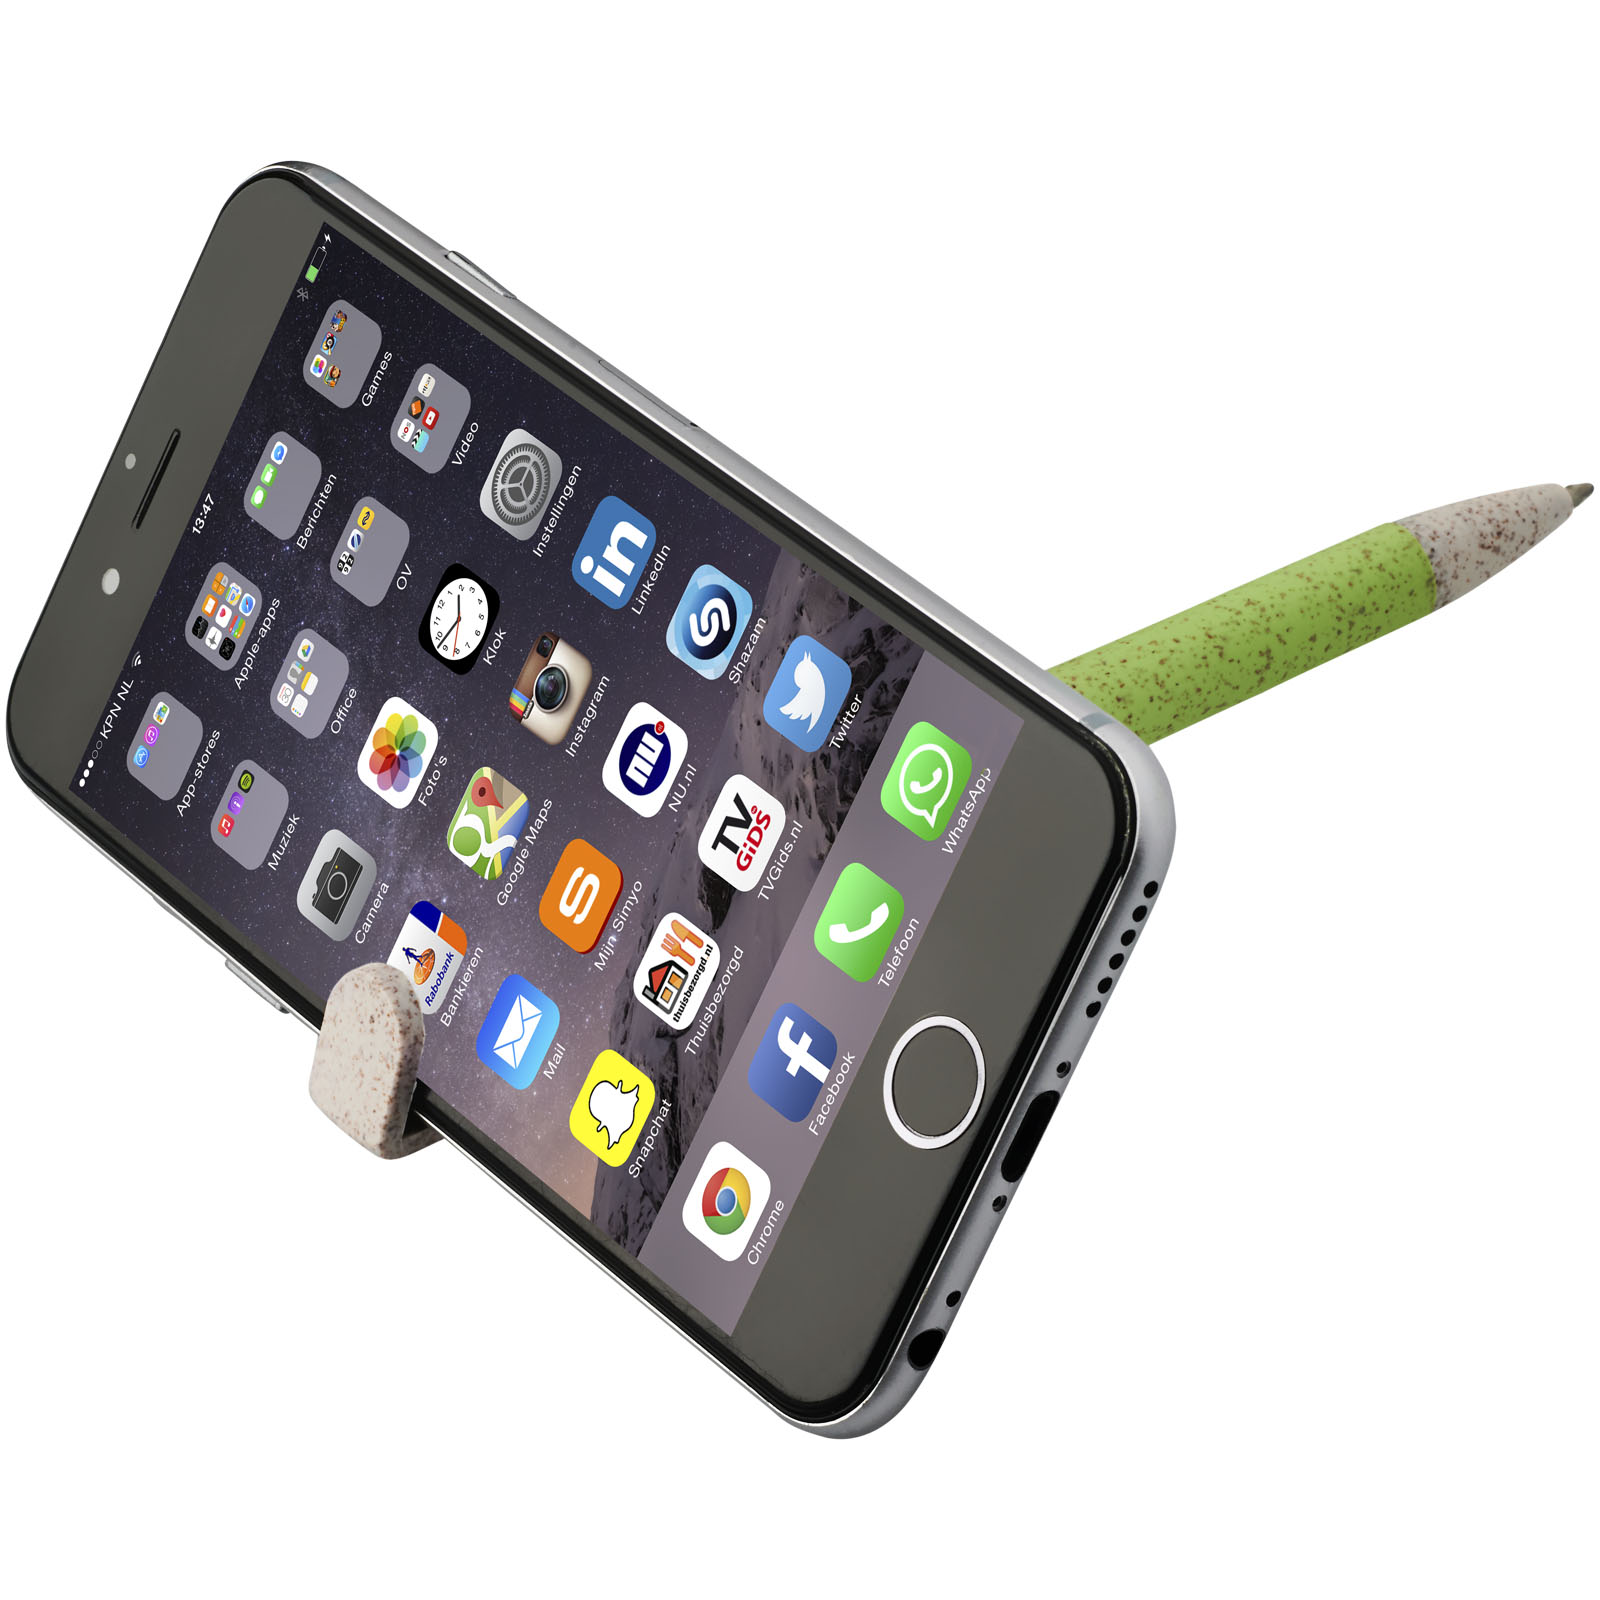 Medan wheat straw ballpoint pen and phone holder